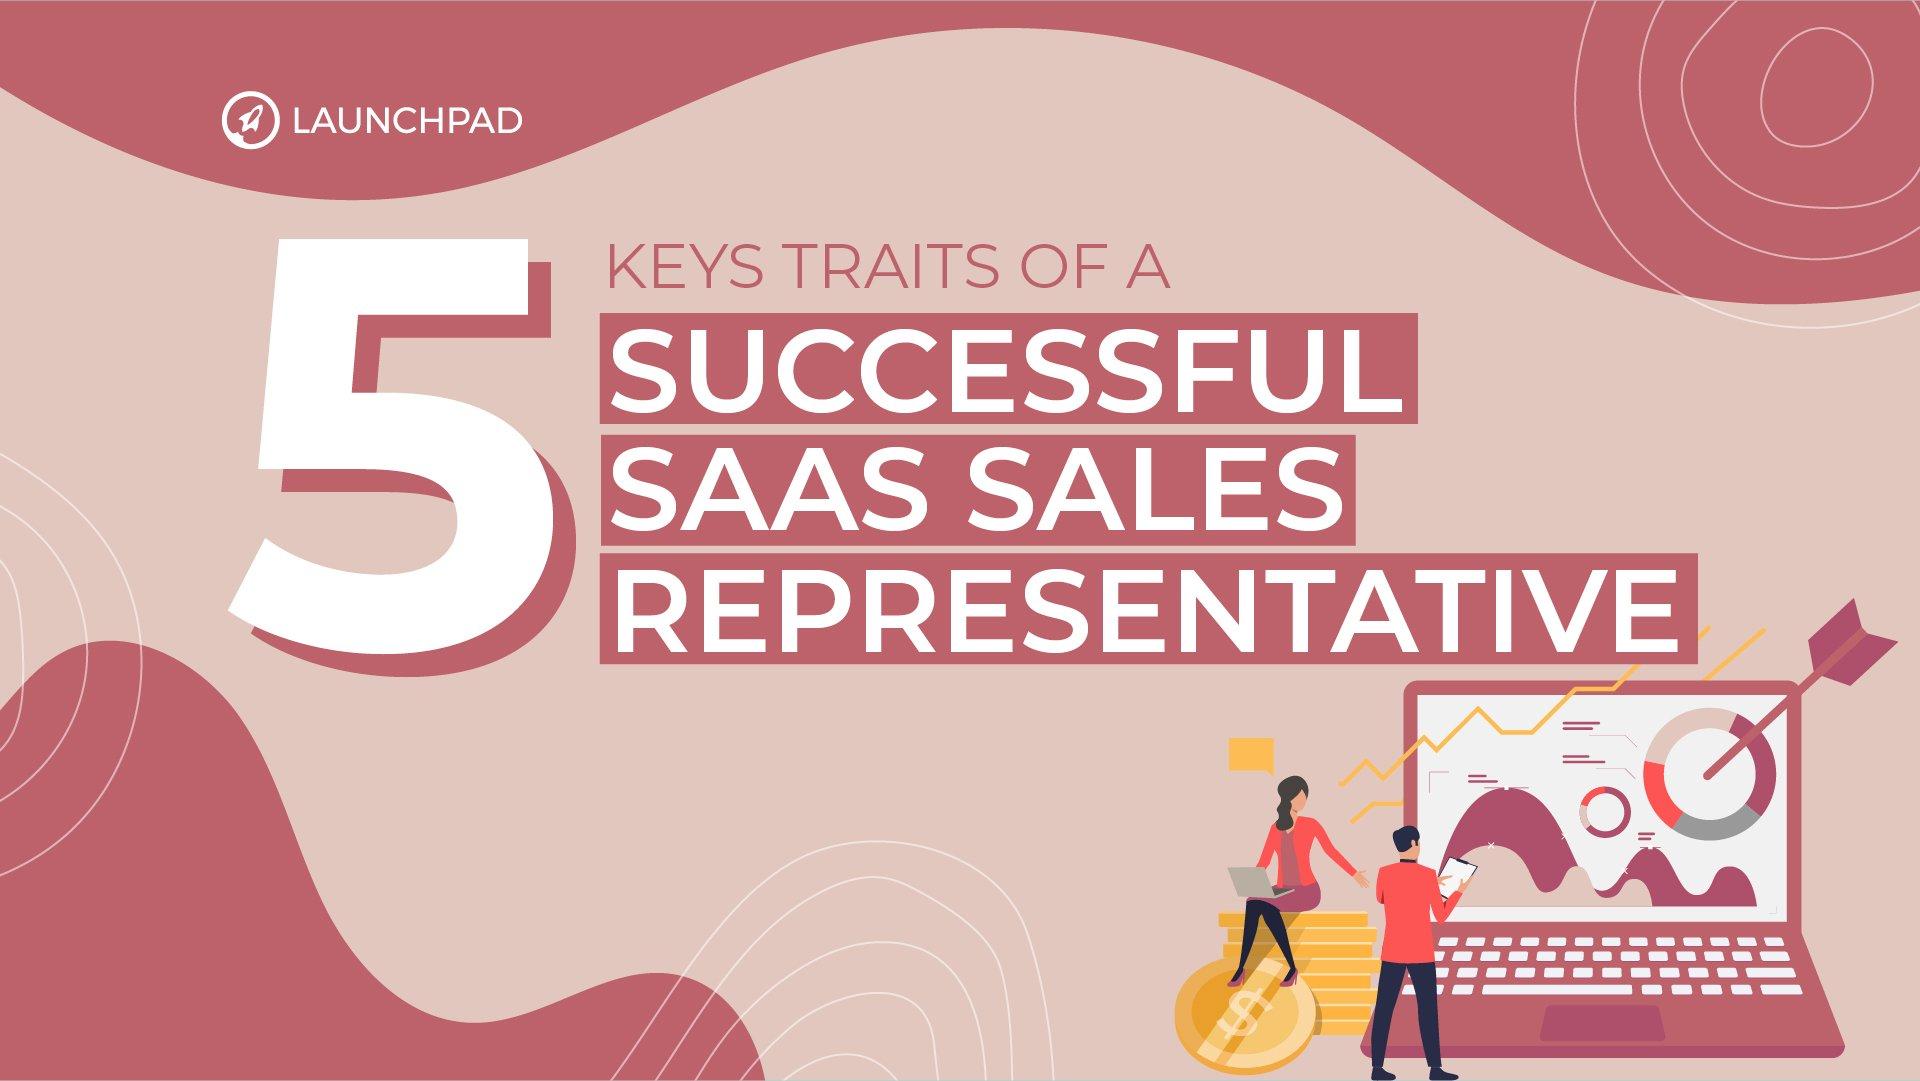 Blog[SM]-5 Keys Traits of a Successful SaaS Sales Representative-02